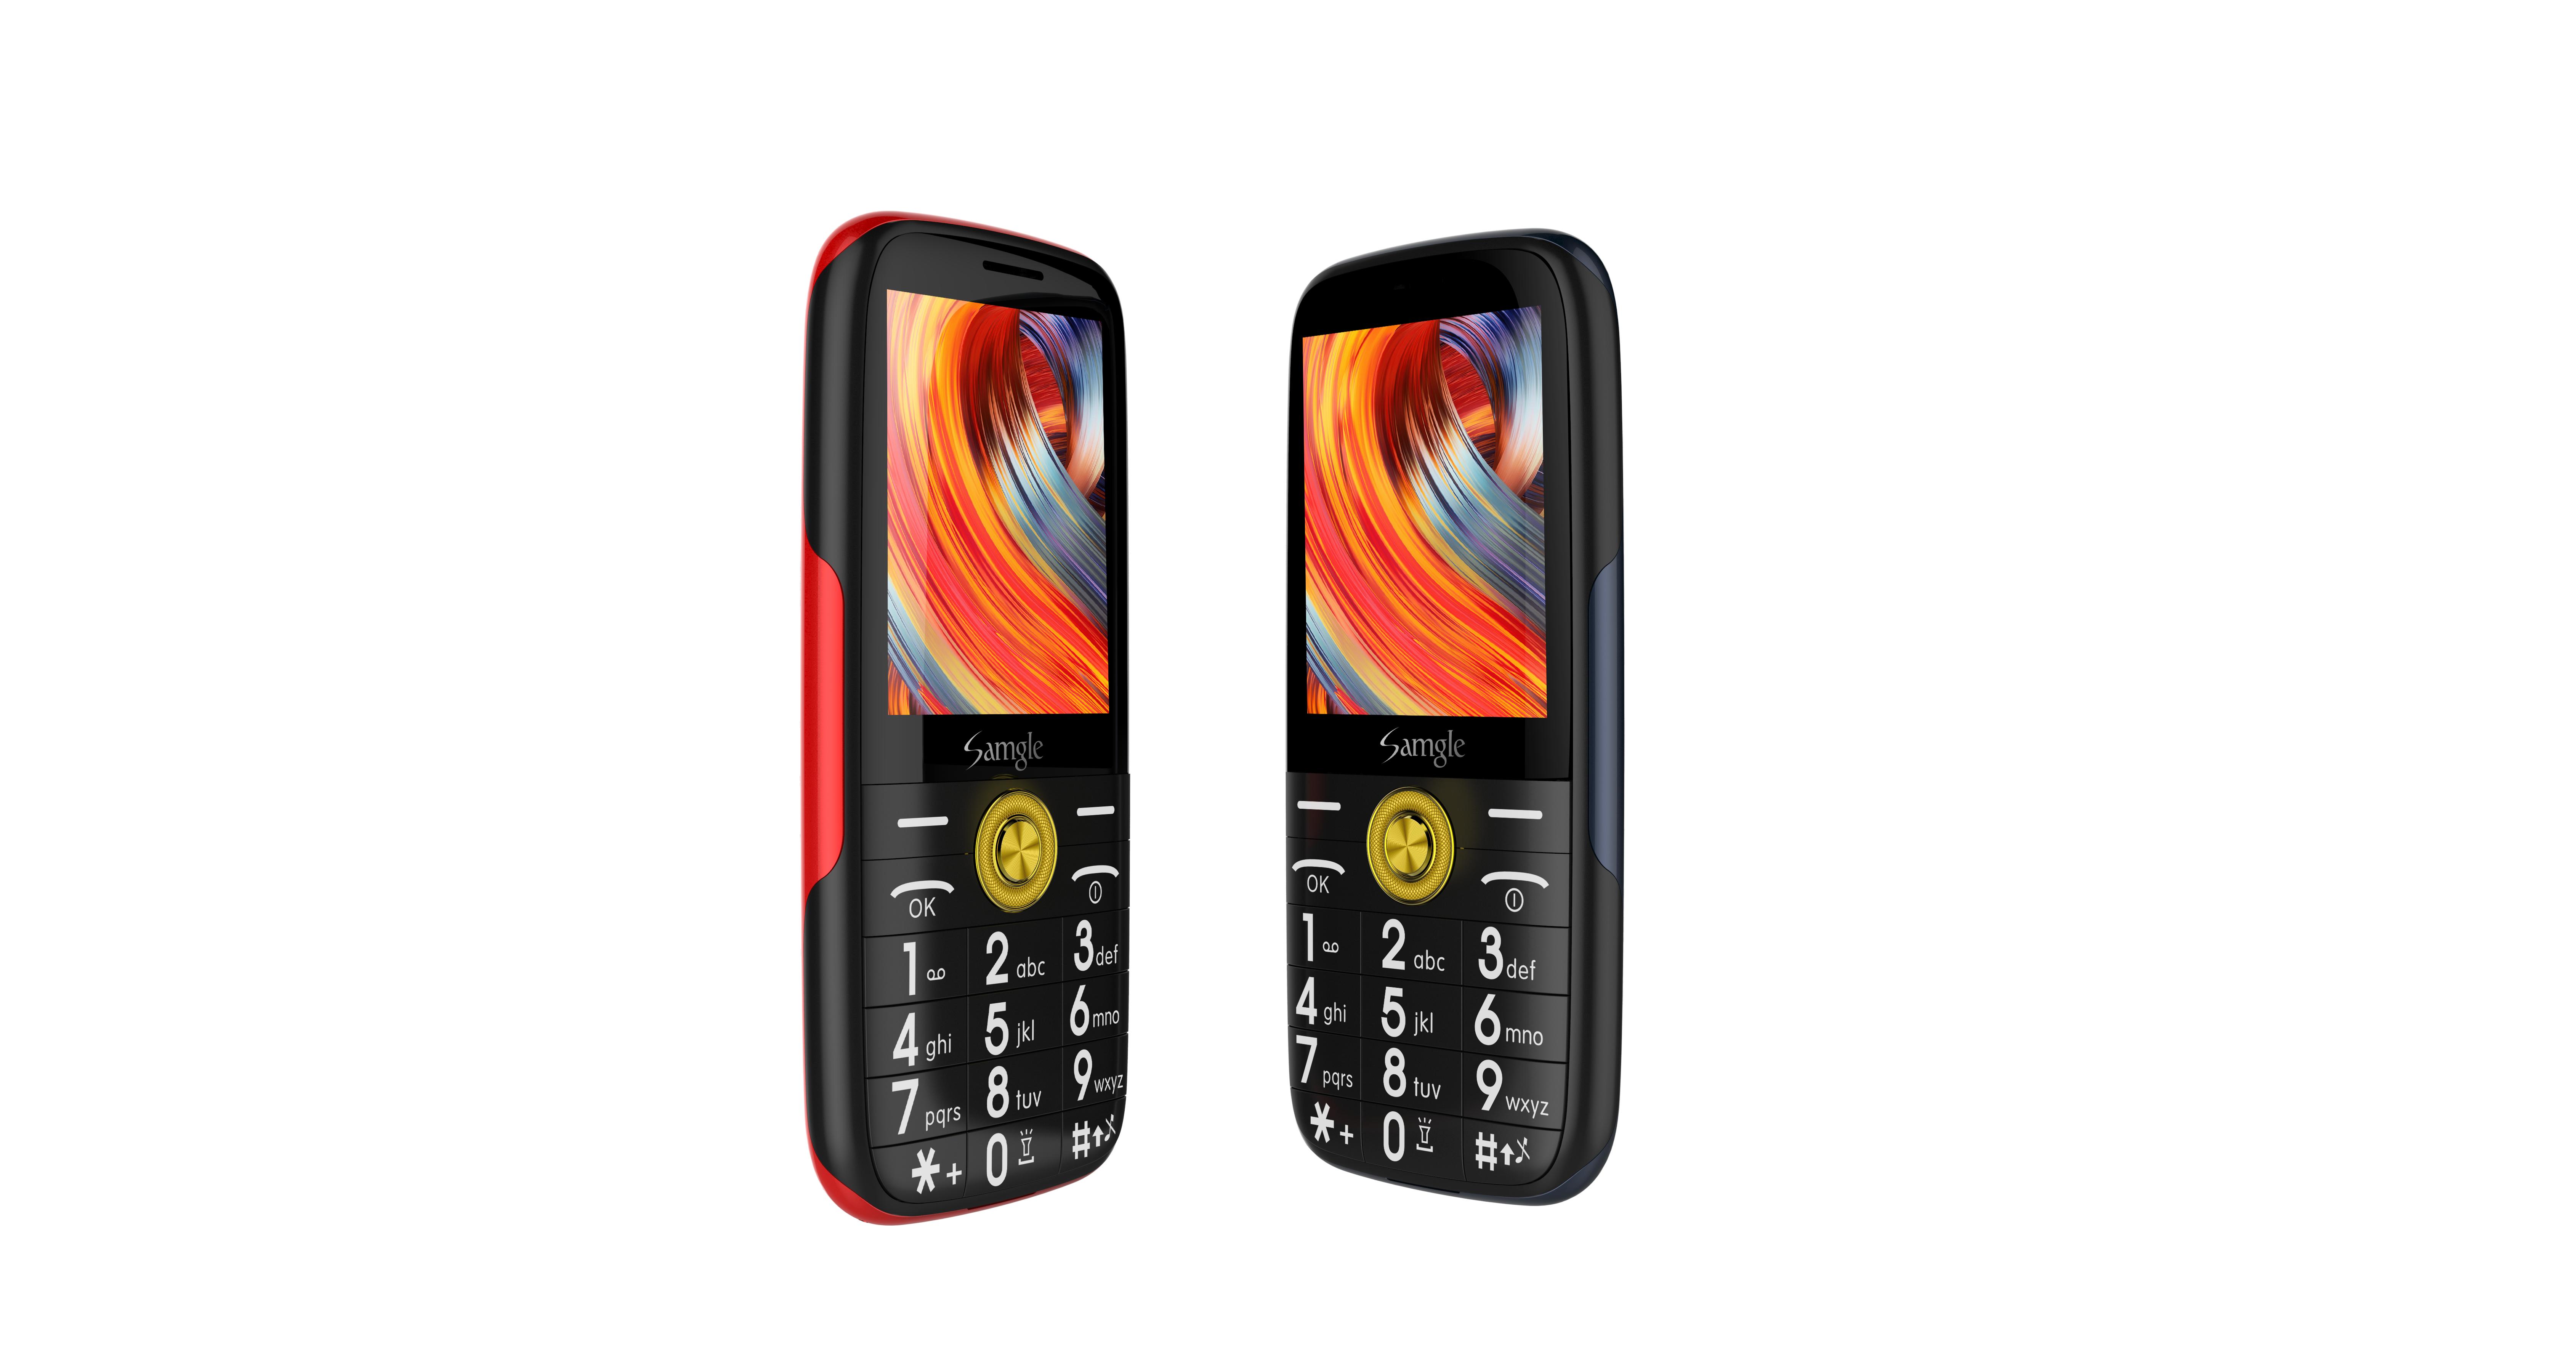 Telefon mobil Samgle Captain 3G, QVGA 2.4 inch, Bluetooth, Digi 3G, Camera, Slot Card, Radio FM, Internet, Dual SIM22